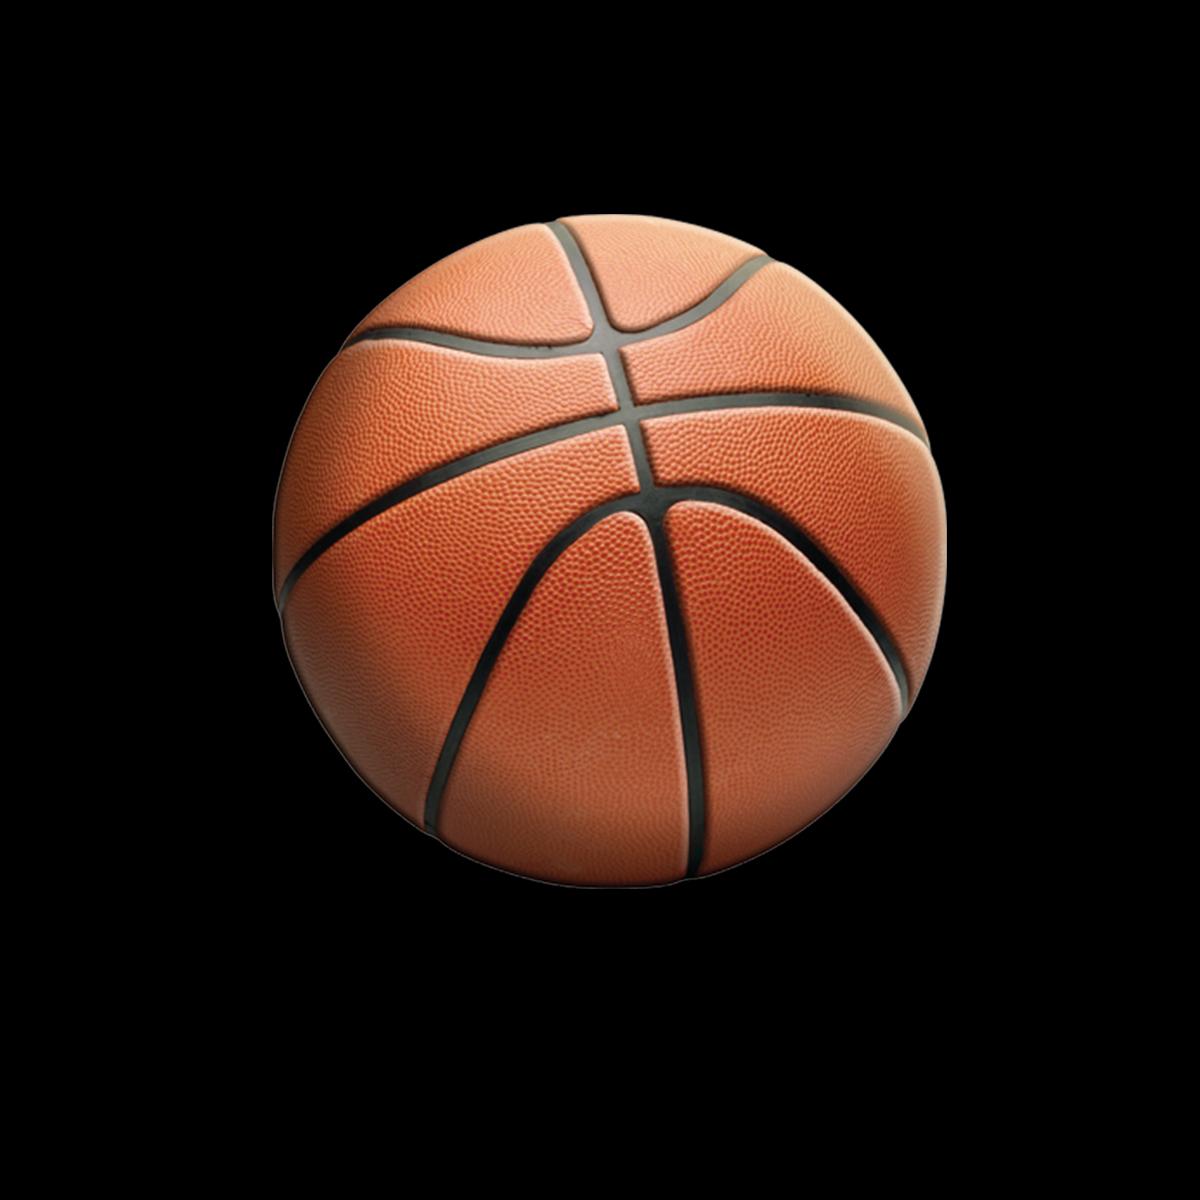 Hoodie Kapuzenpulli Pullover Basketball Sport Hobby Team Wear Ball S-3XL NEU